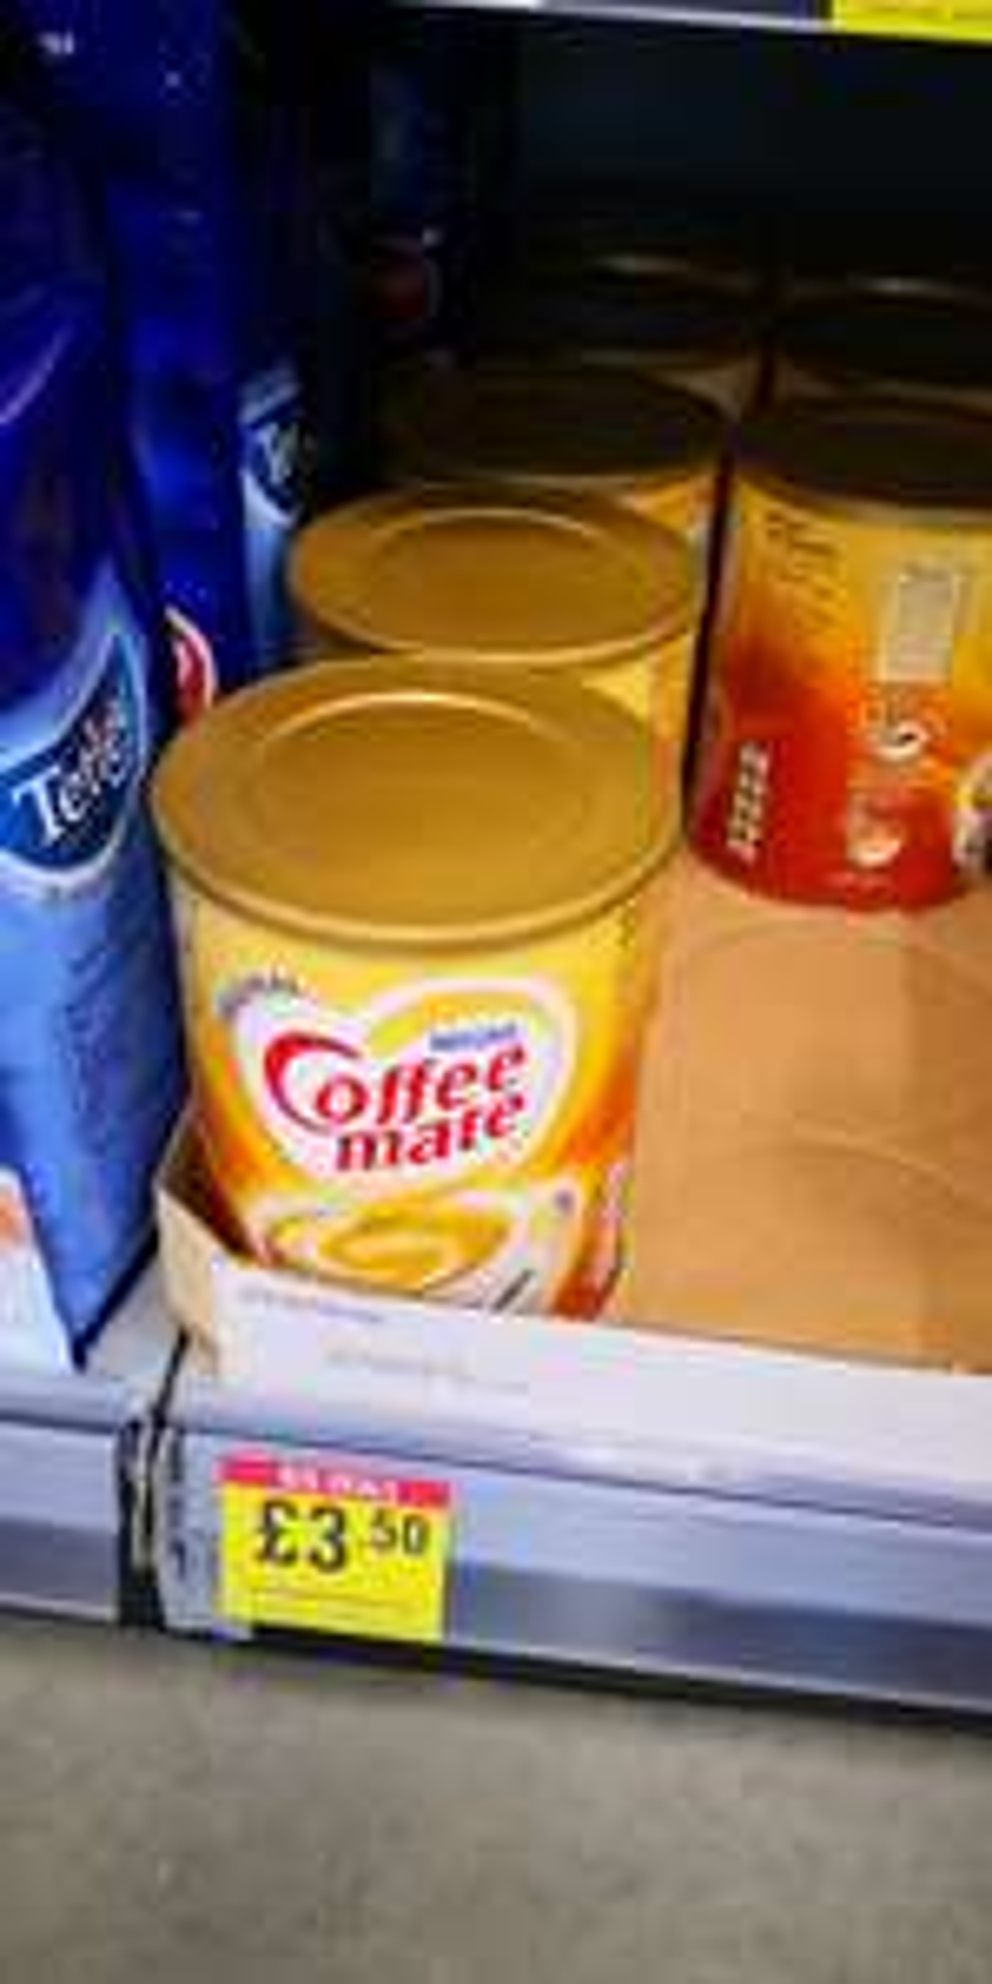 Nestle original coffee mate £3.50 instore @ The Food Warehouse